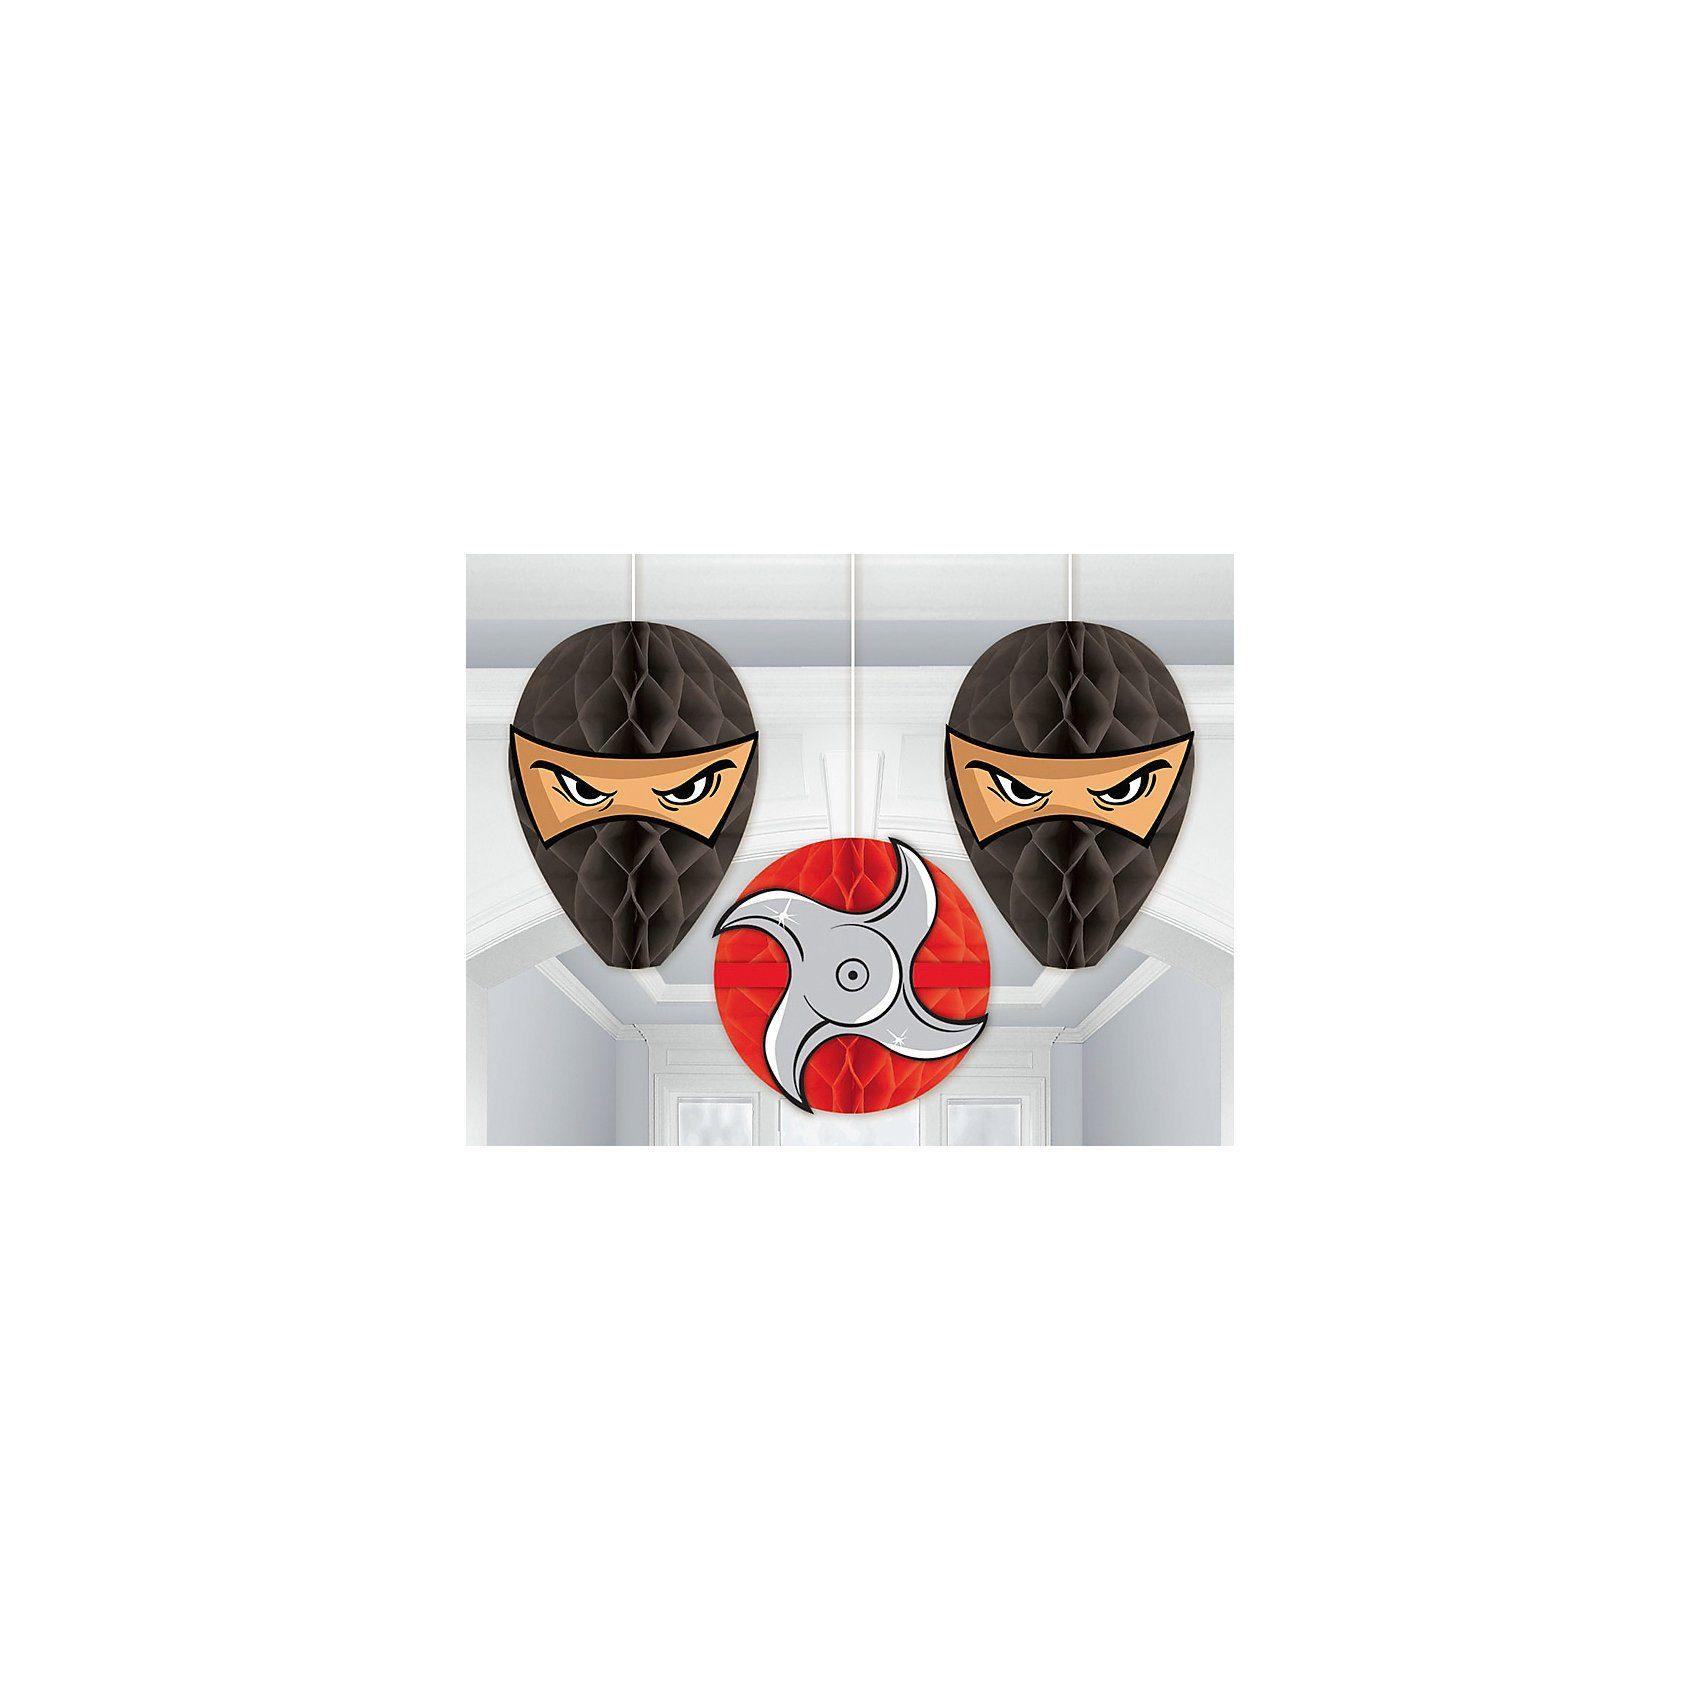 Amscan Wabendekoration Ninja, 3 Stück